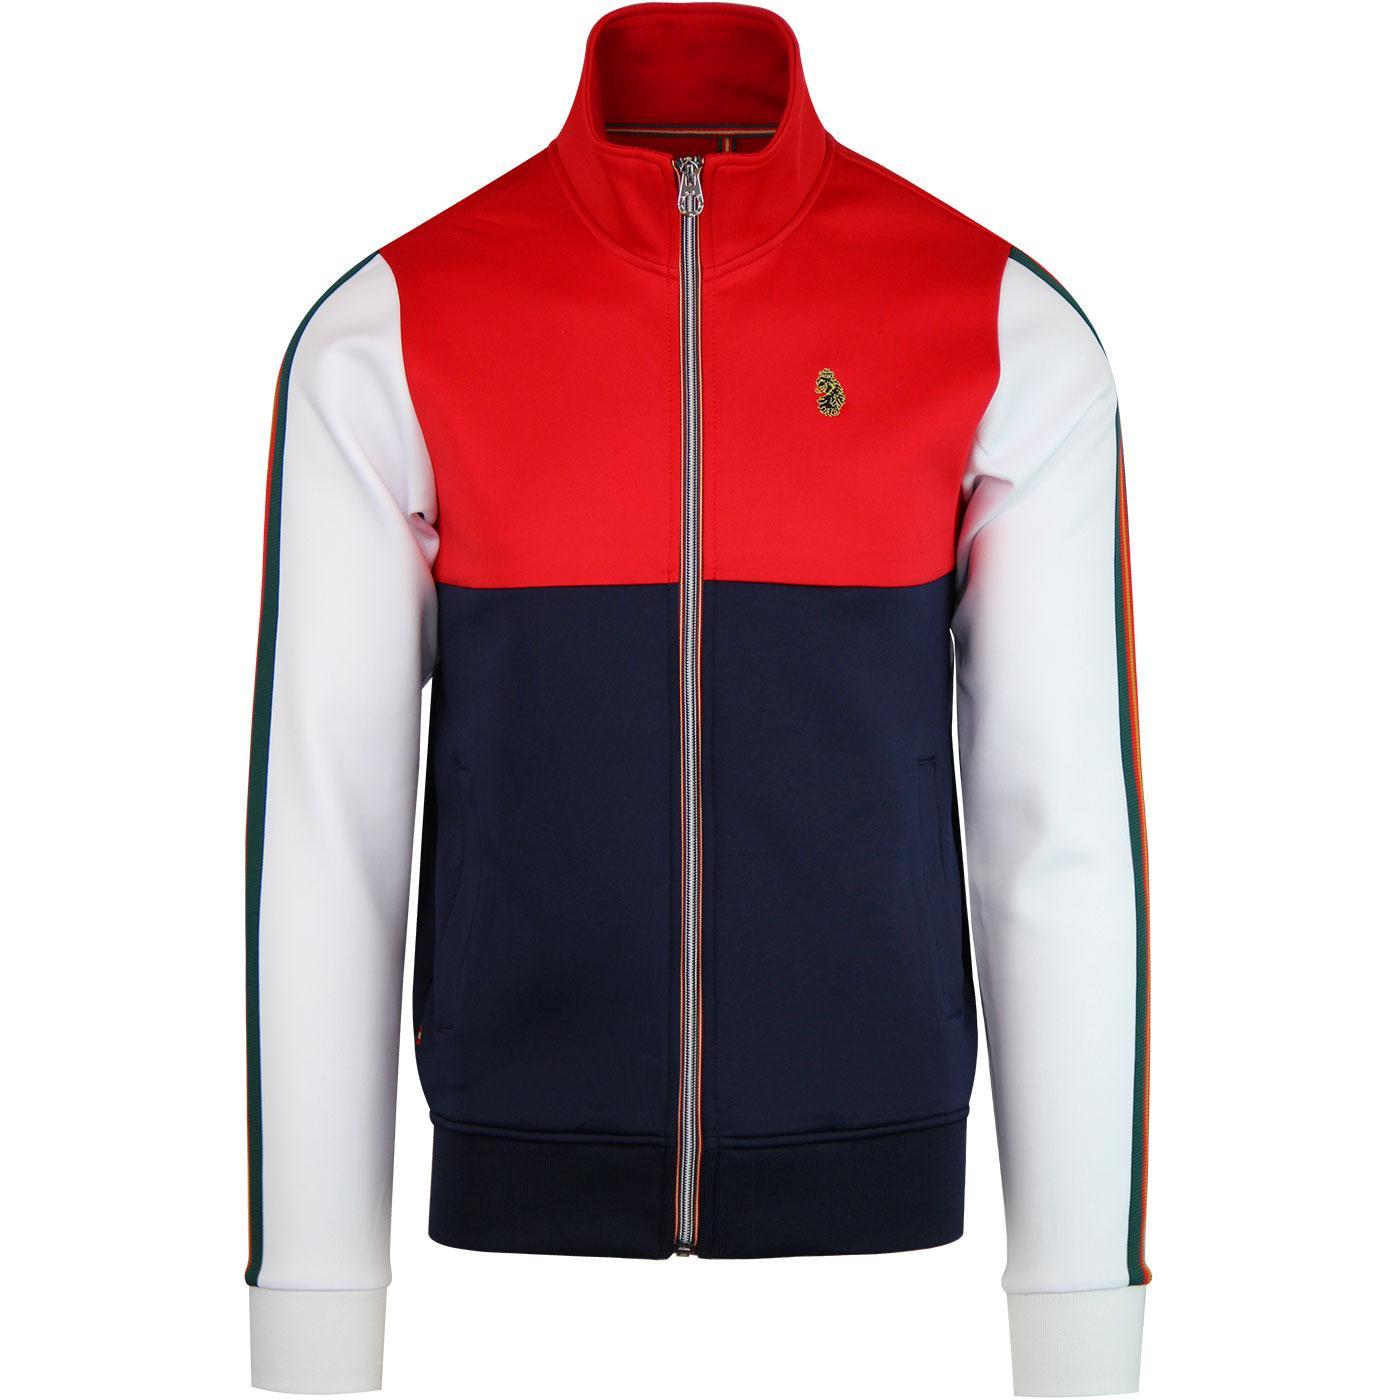 Hoddle LUKE Men's Retro 70s Sports Track Jacket